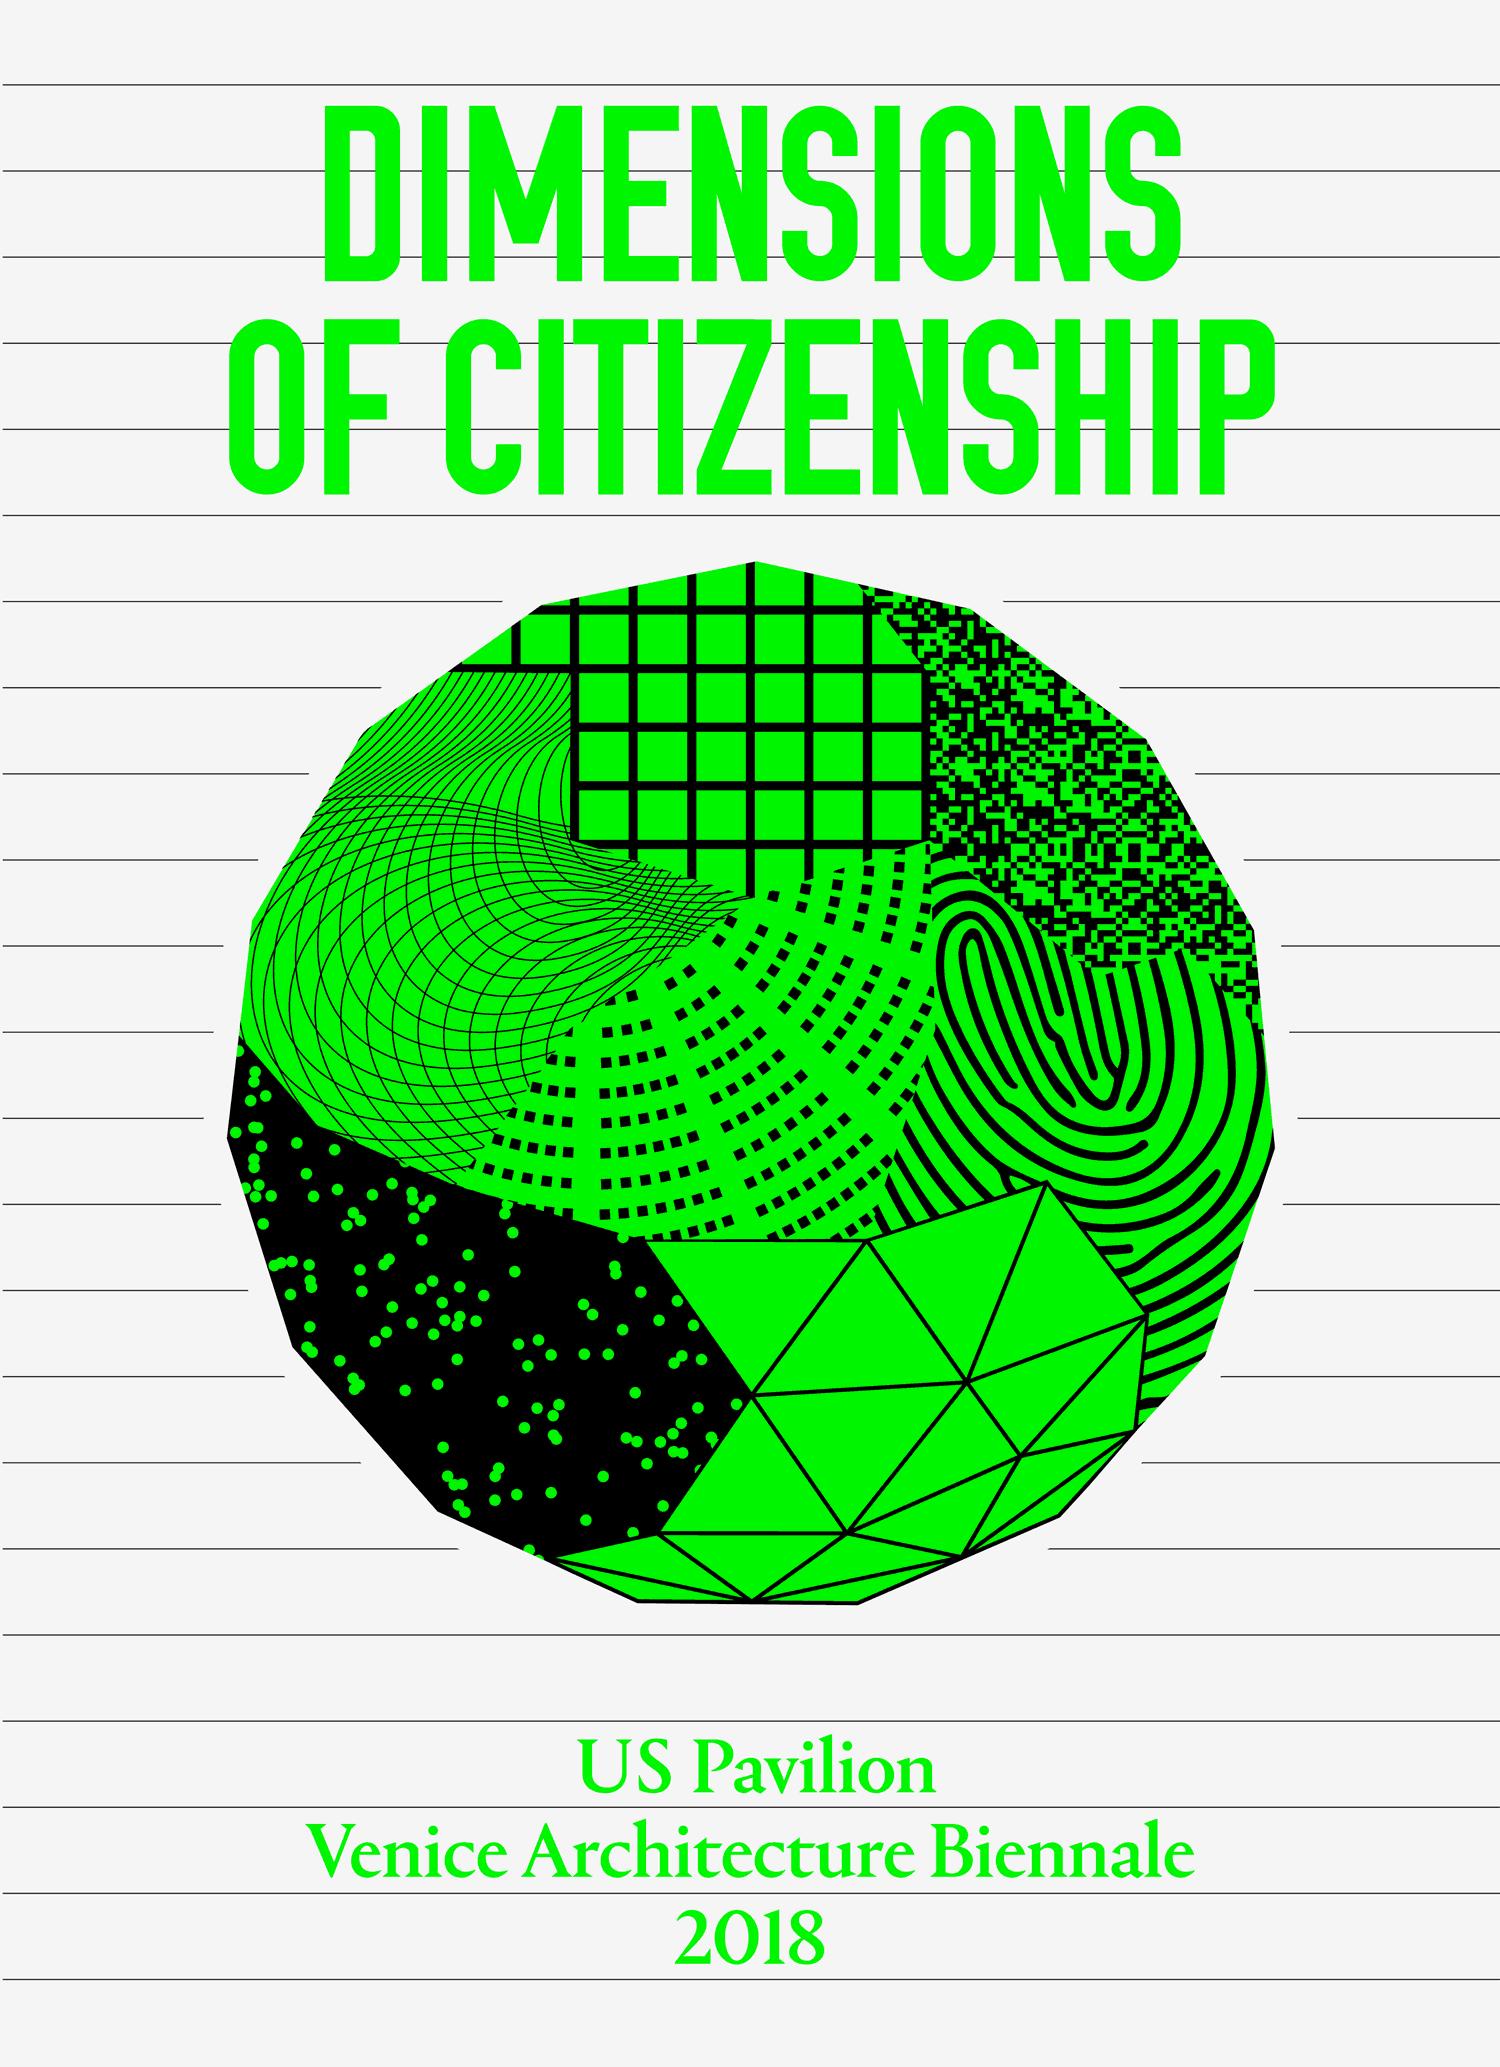 Dimensions of Citizenship design